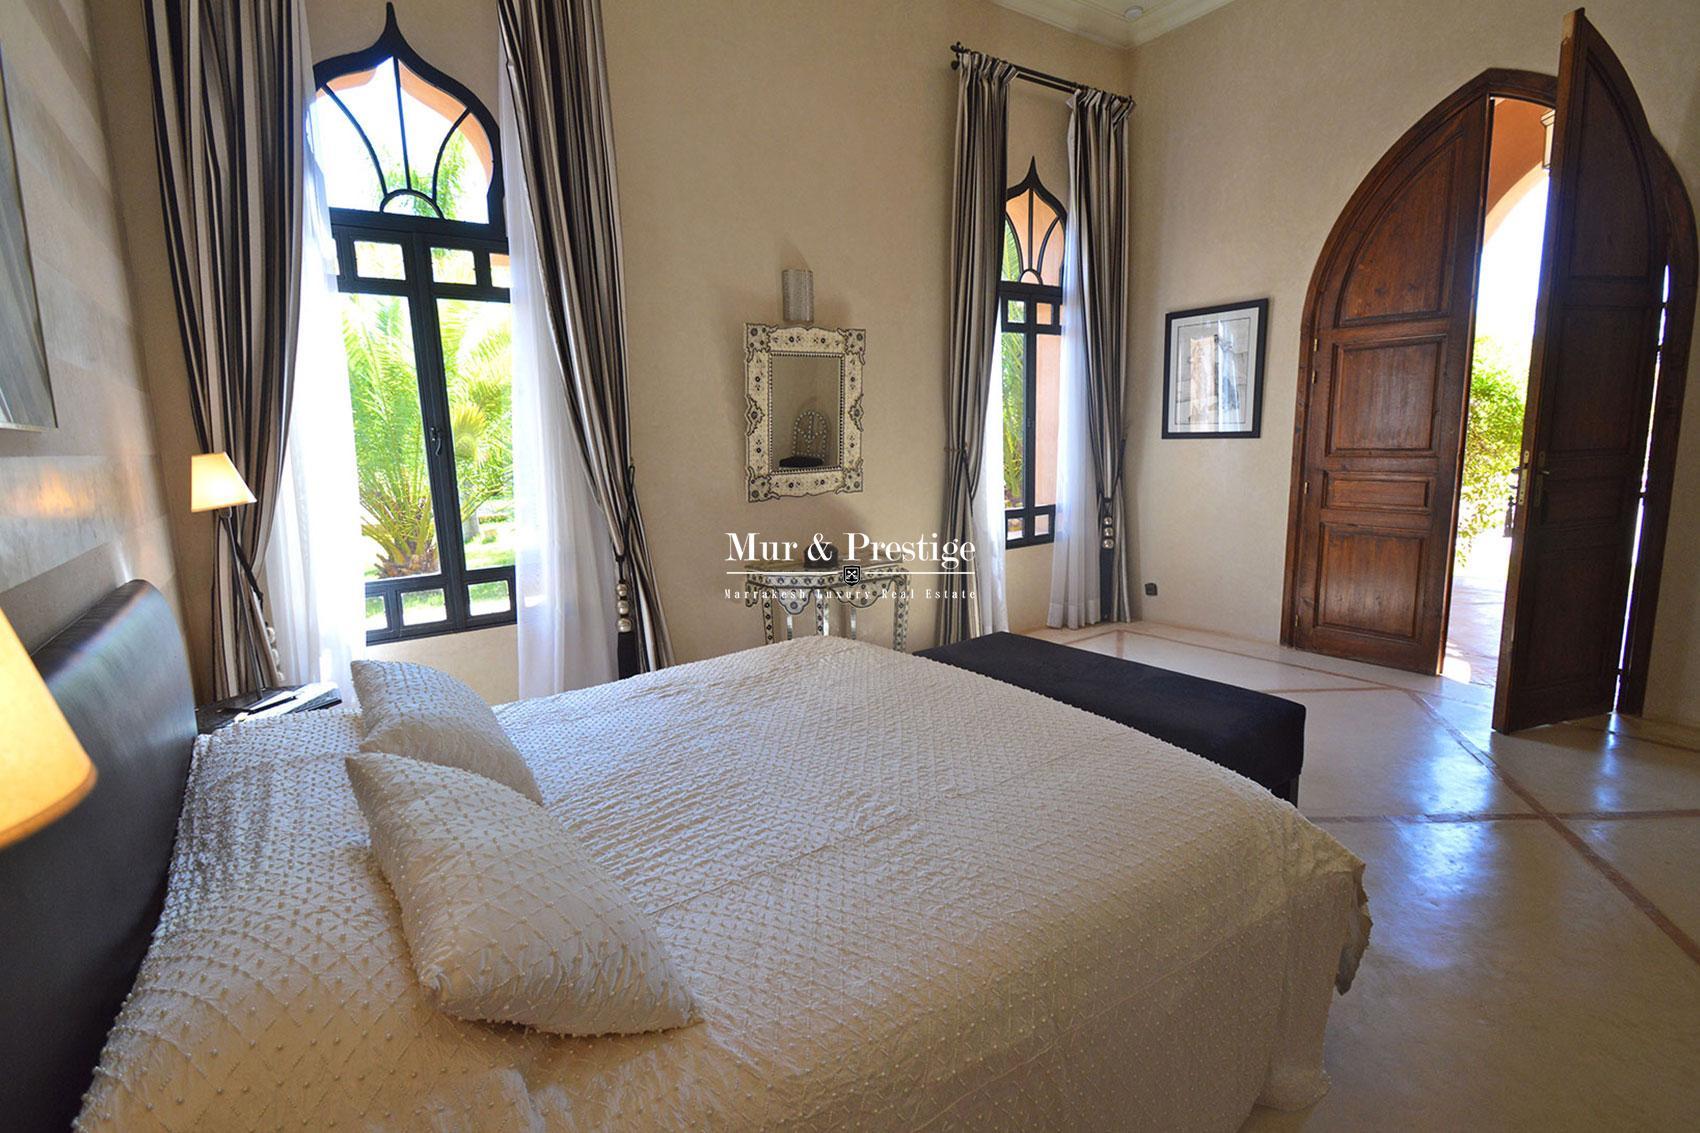 Vente villa de charme Marrakech - copie